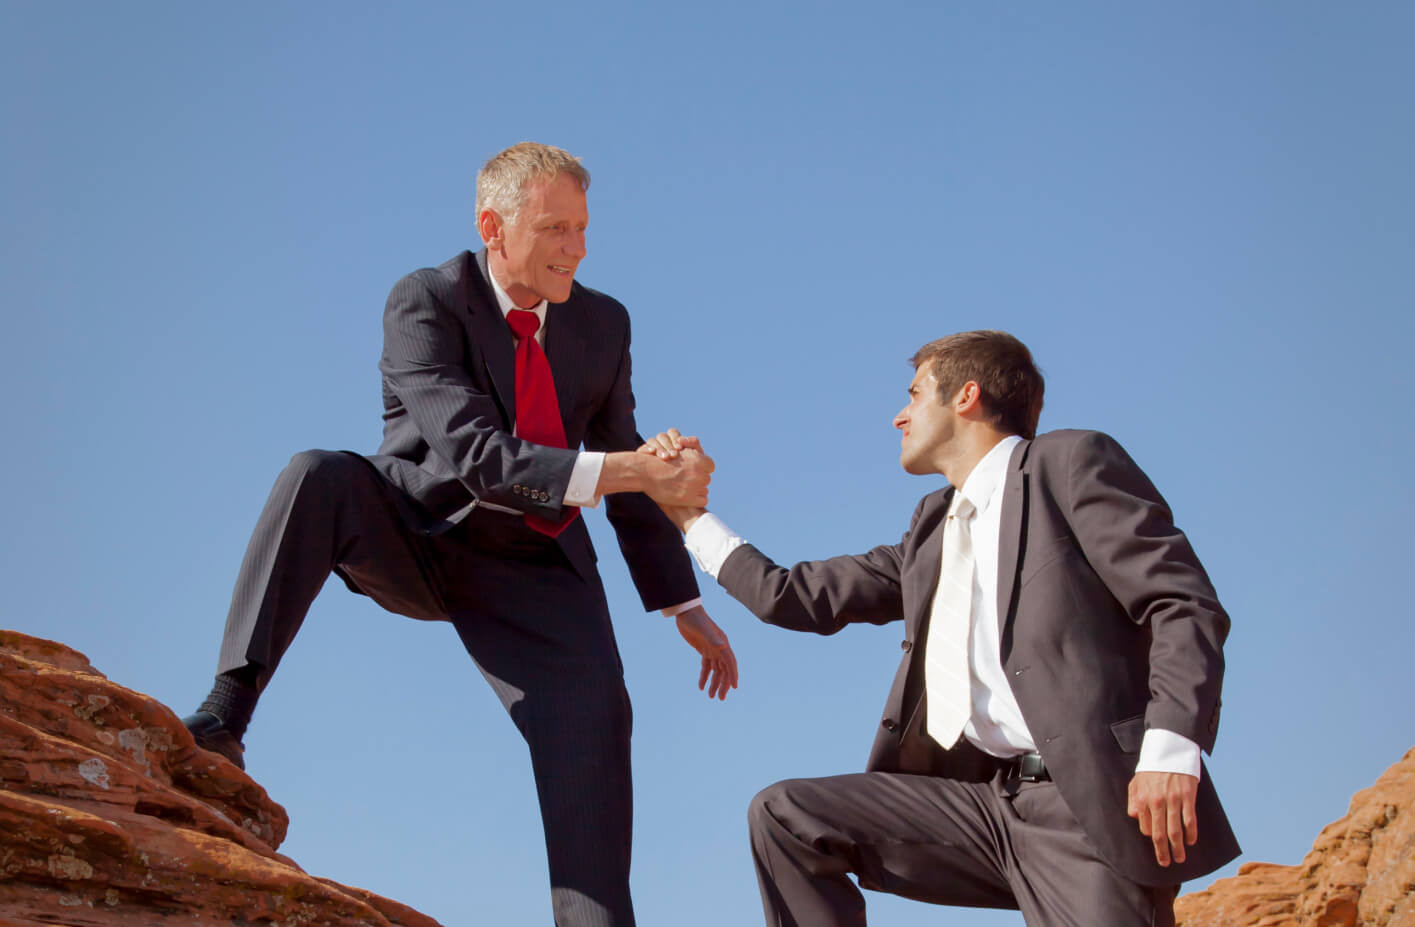 15 Langkah Menjadi Pemimpin Yang Baik Bijaksana Rote Ndao